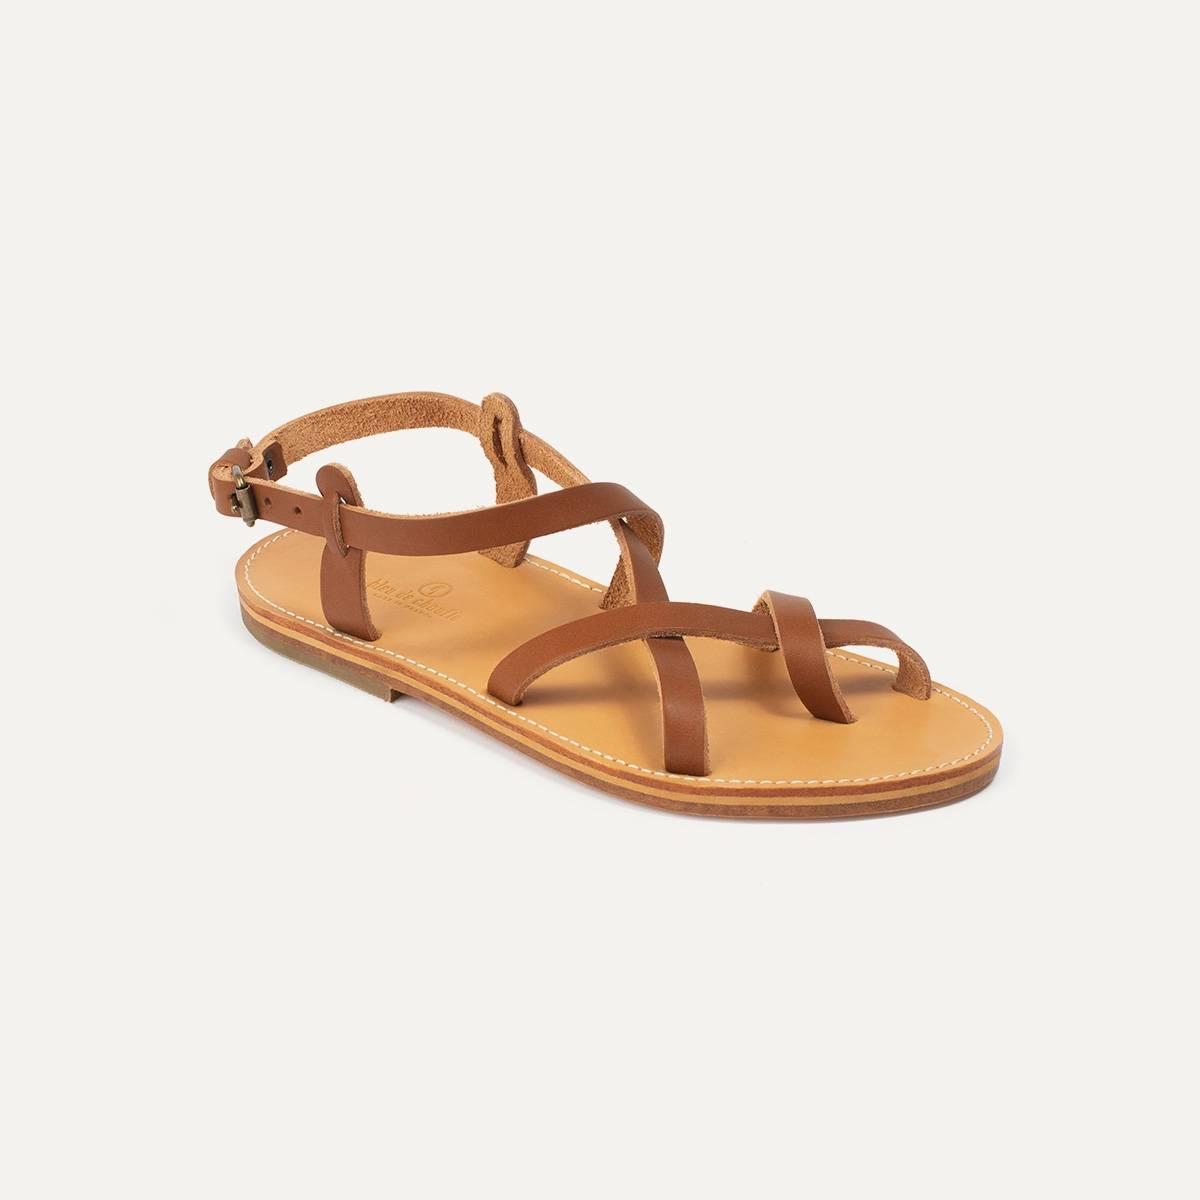 Nara leather sandals - Pain Brûlé (image n°2)